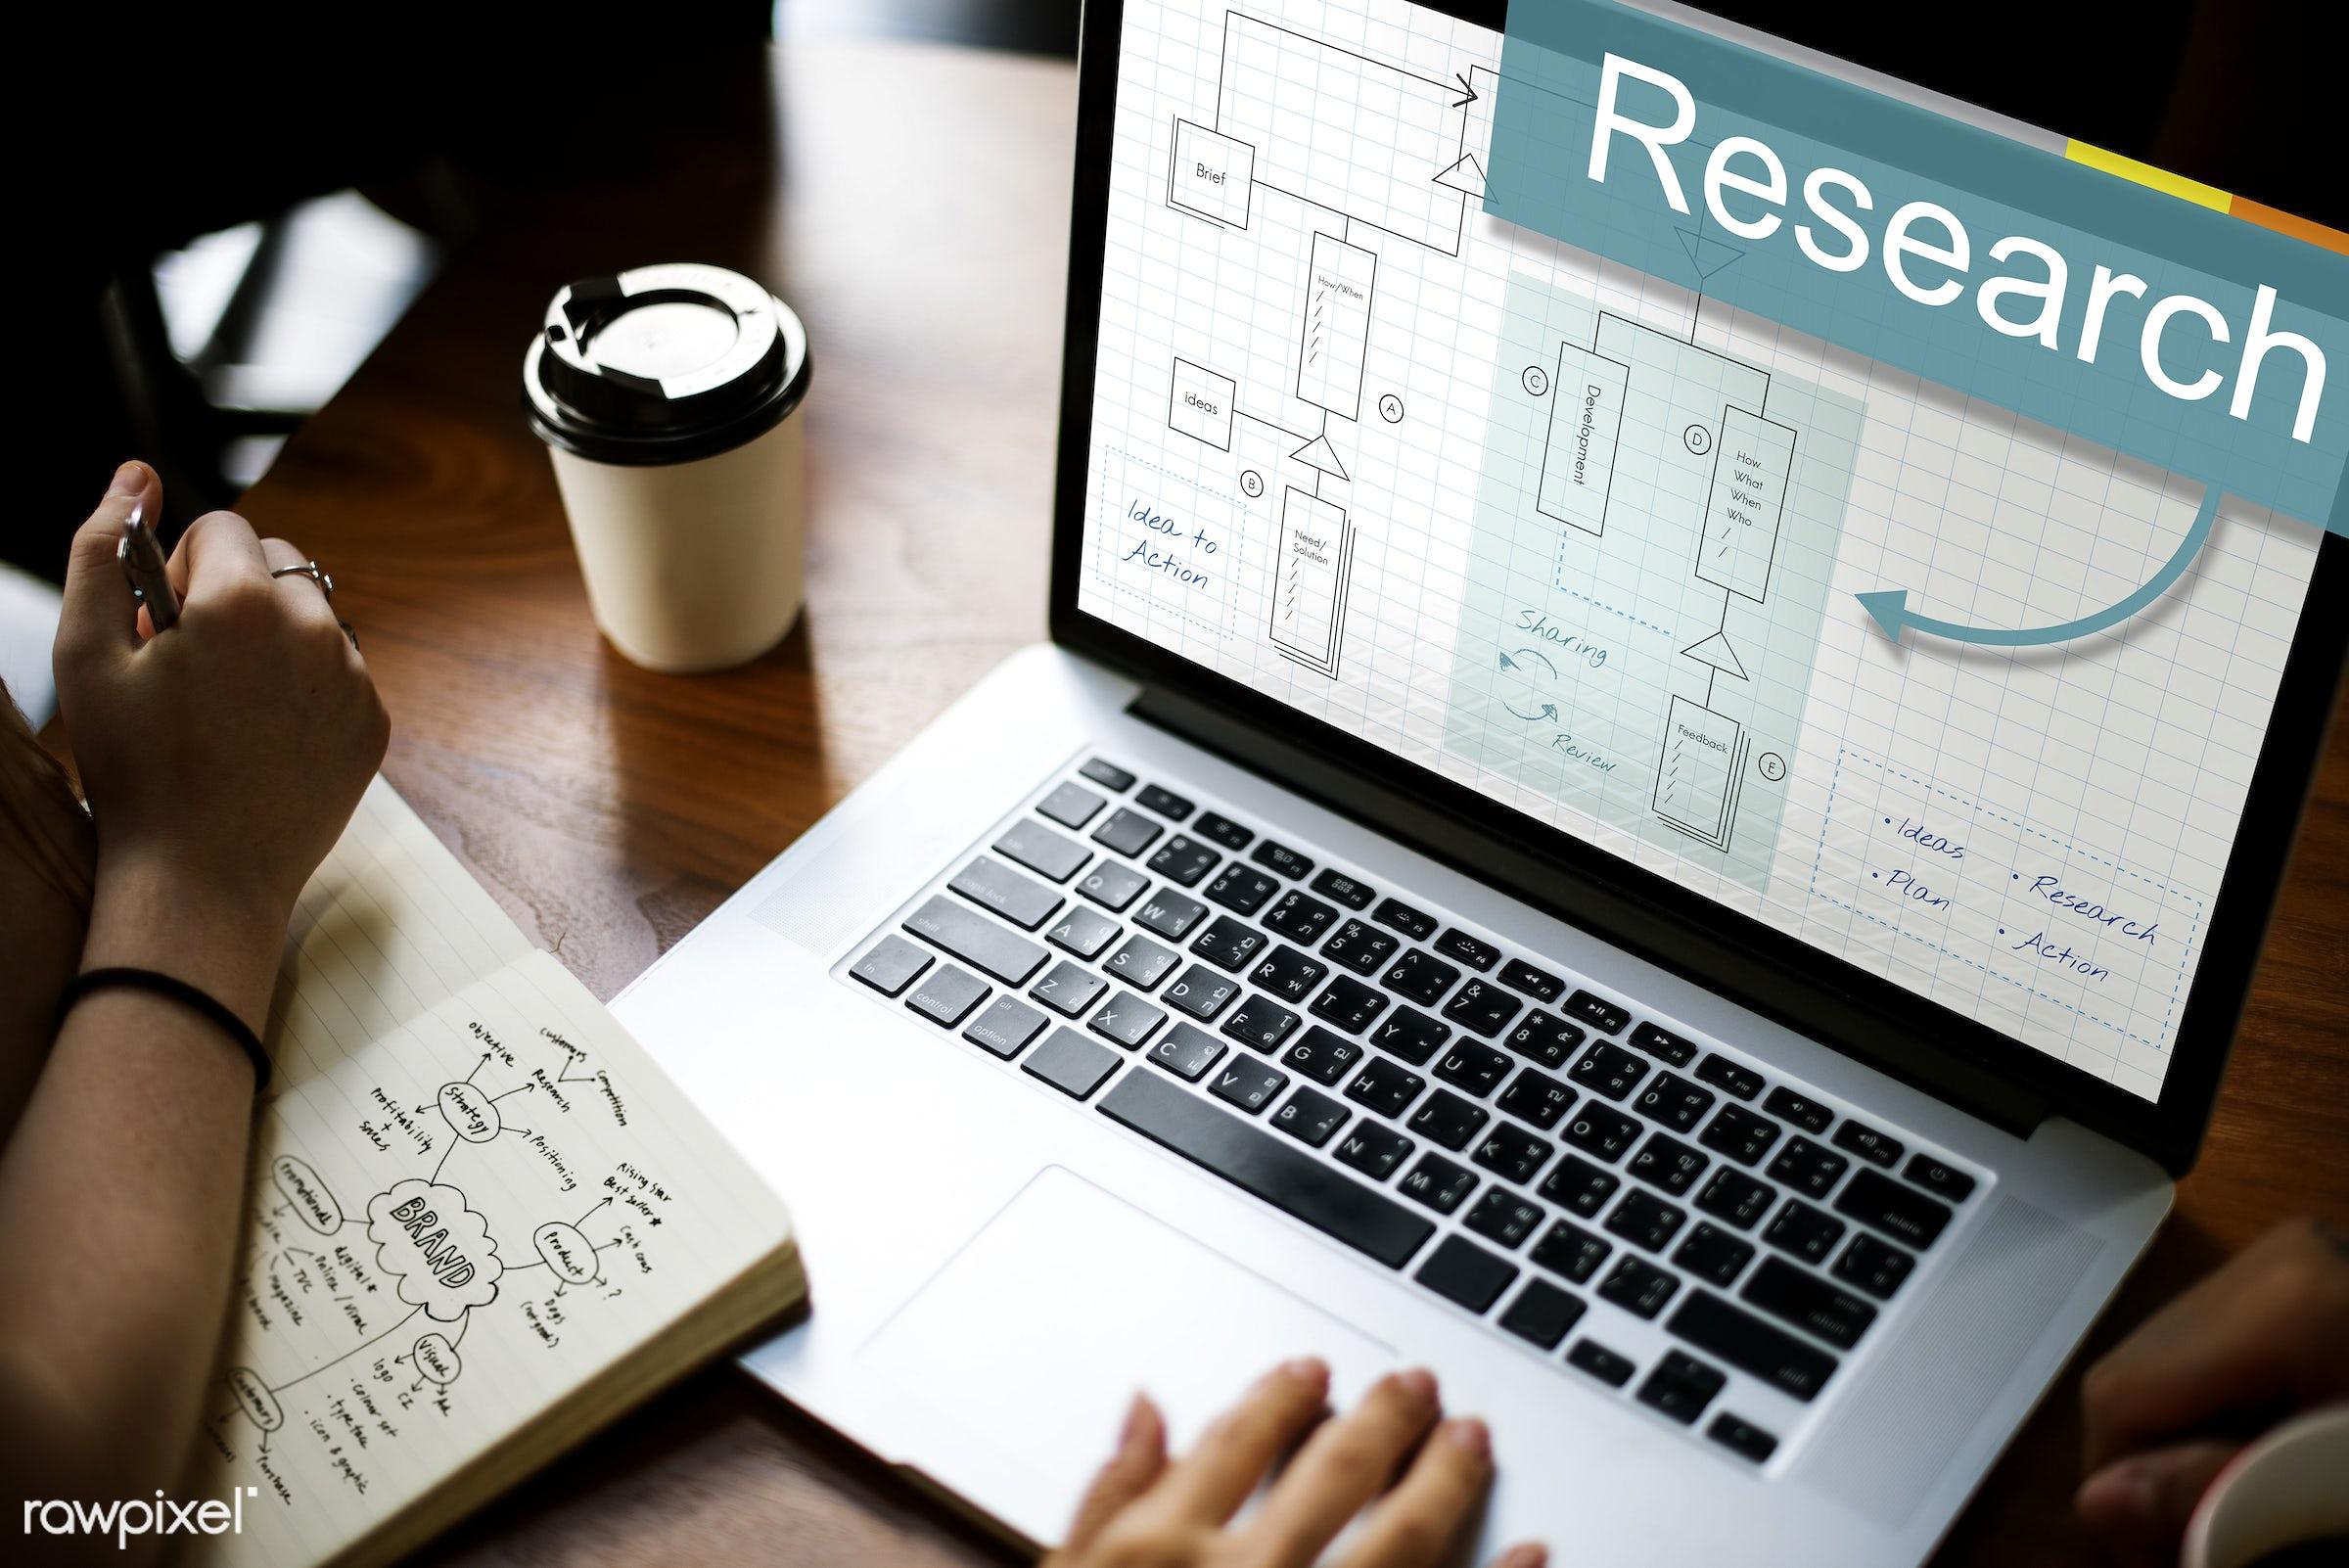 action, analysis, brainstorm, browsing, business, coffee cup, data, determine, development, device, diagram, digital,...